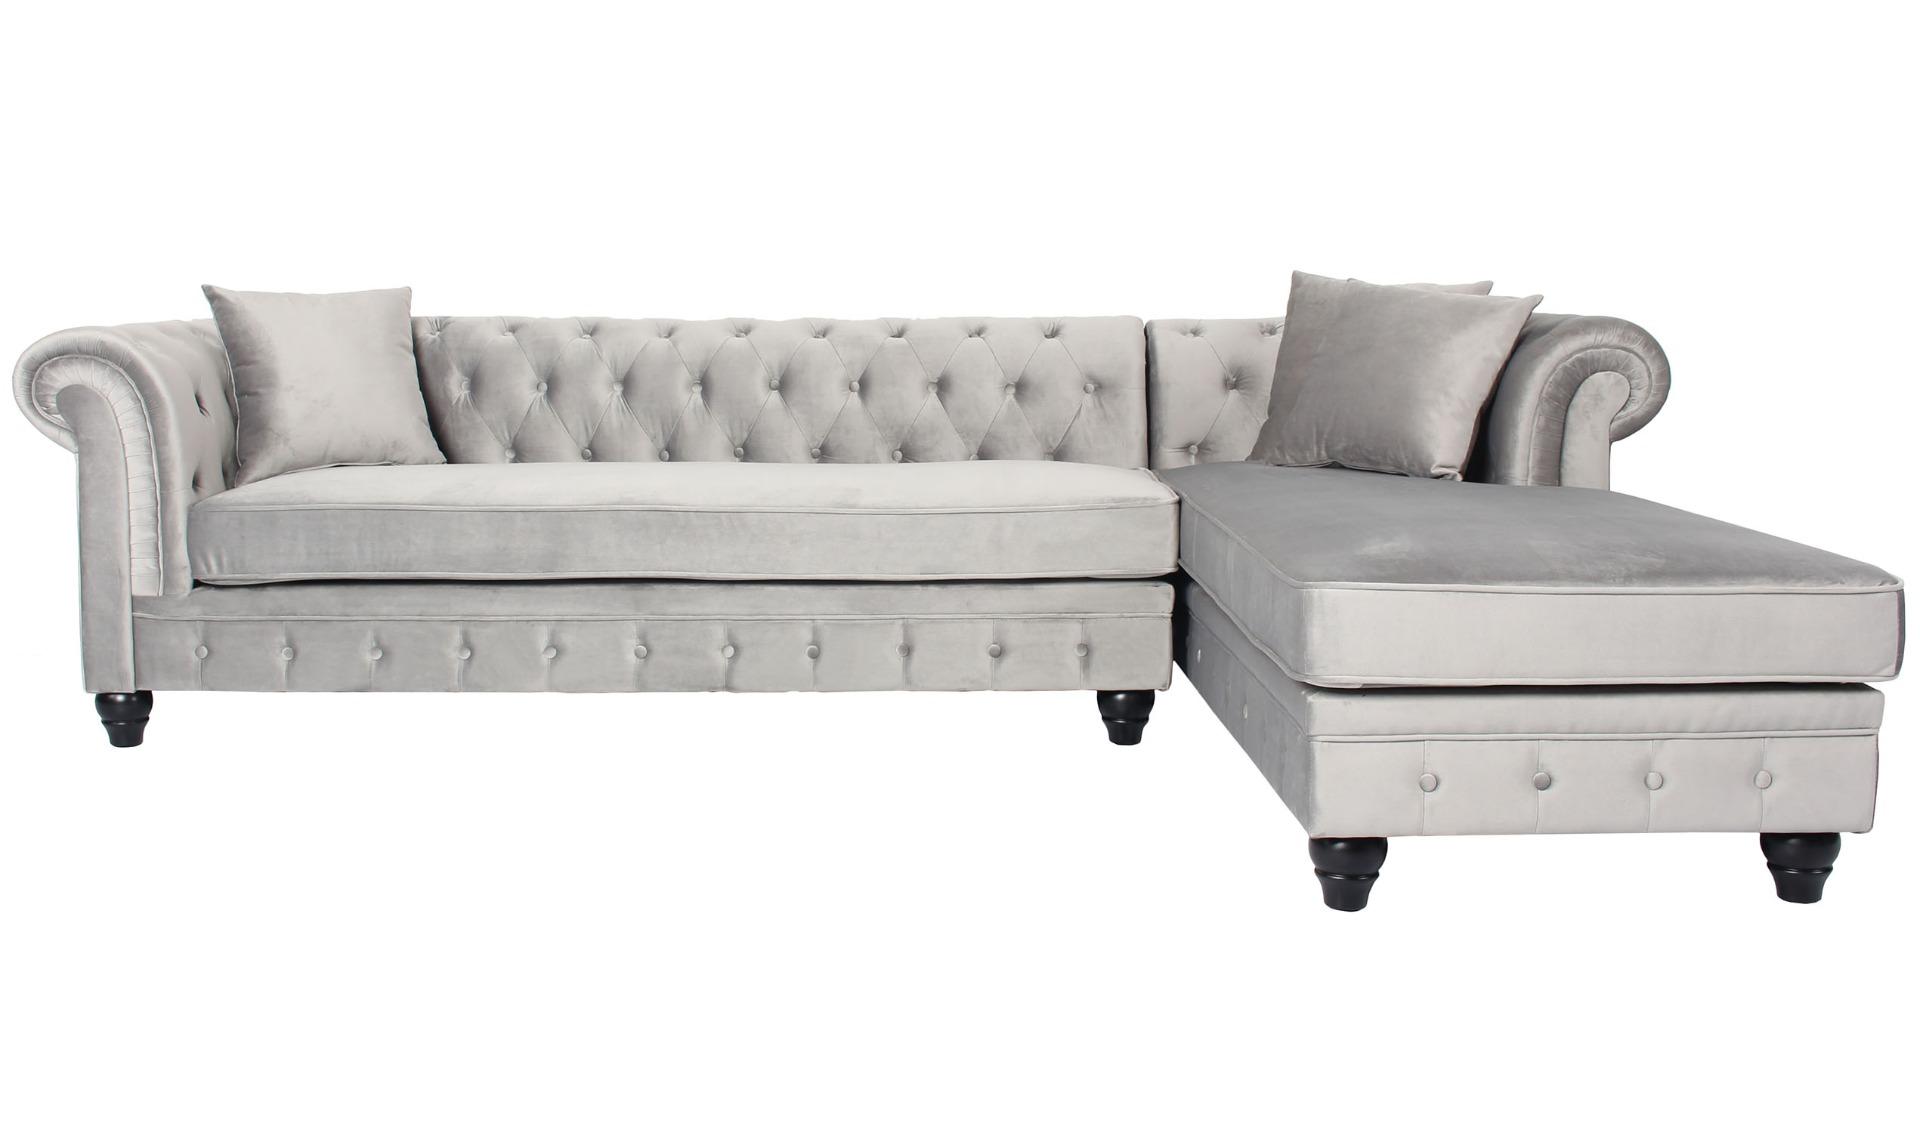 Canapé d'angle capitonné style chesterfield Roosevelt Velours Argent